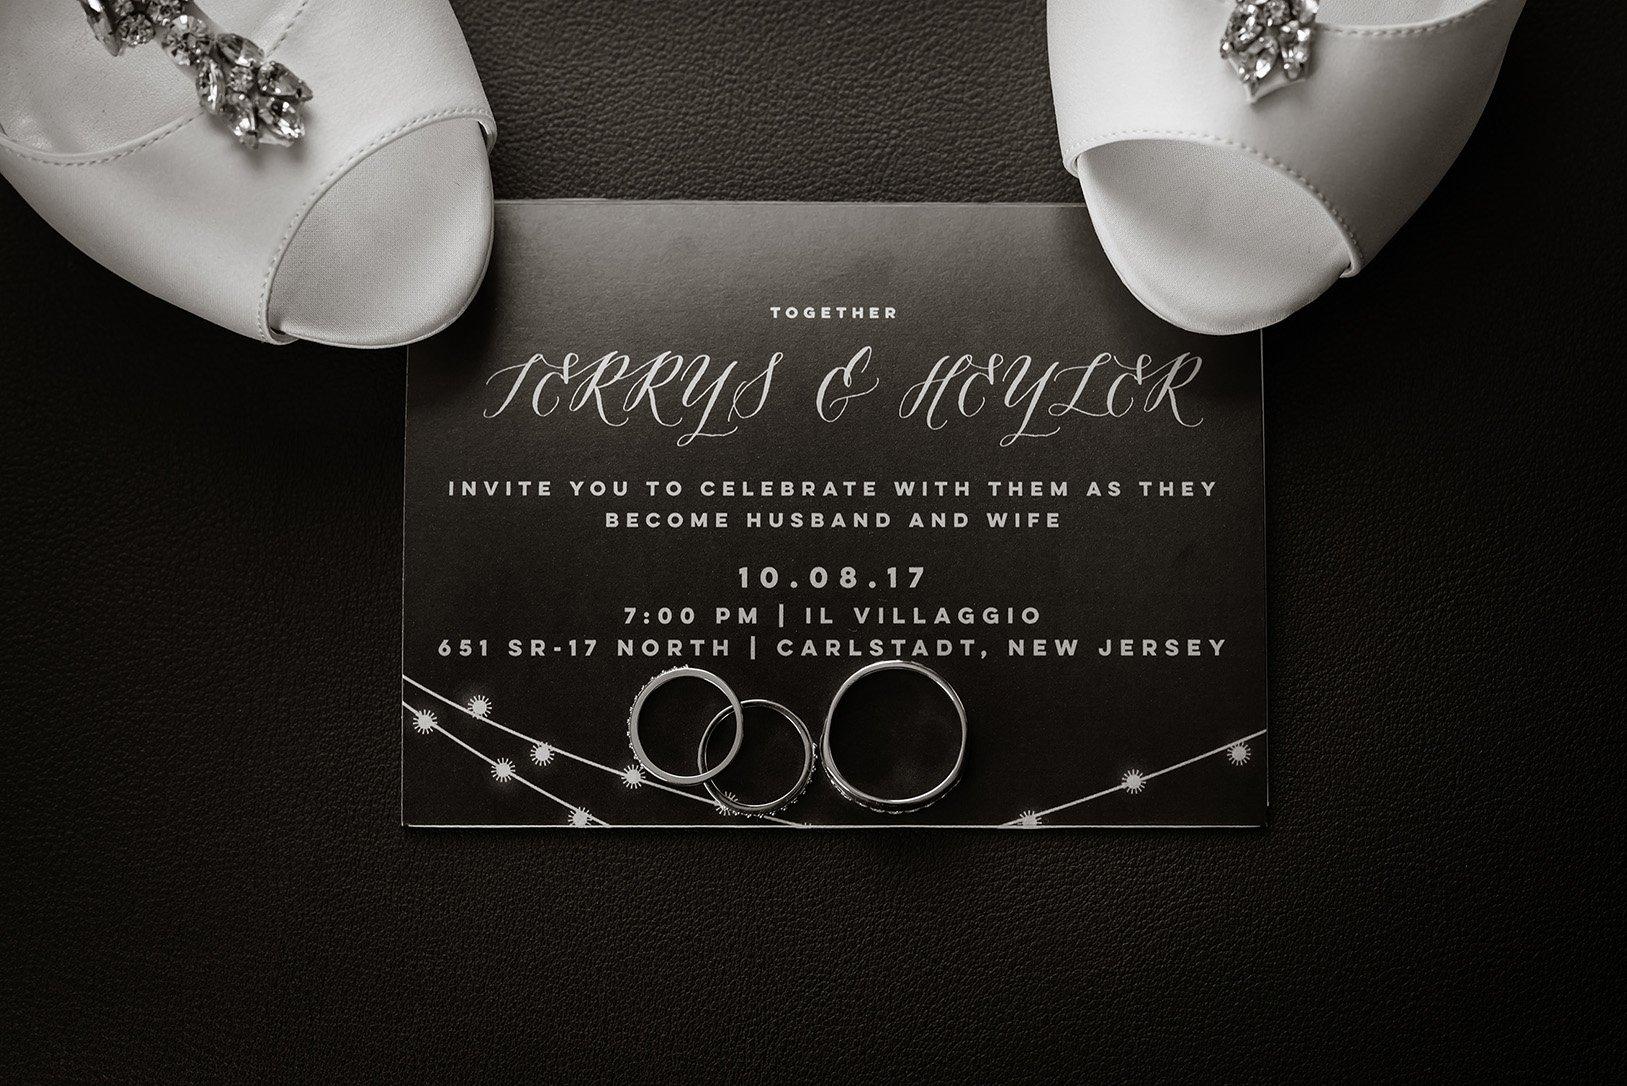 New-Jersey-Wedding-Photo-Details Details